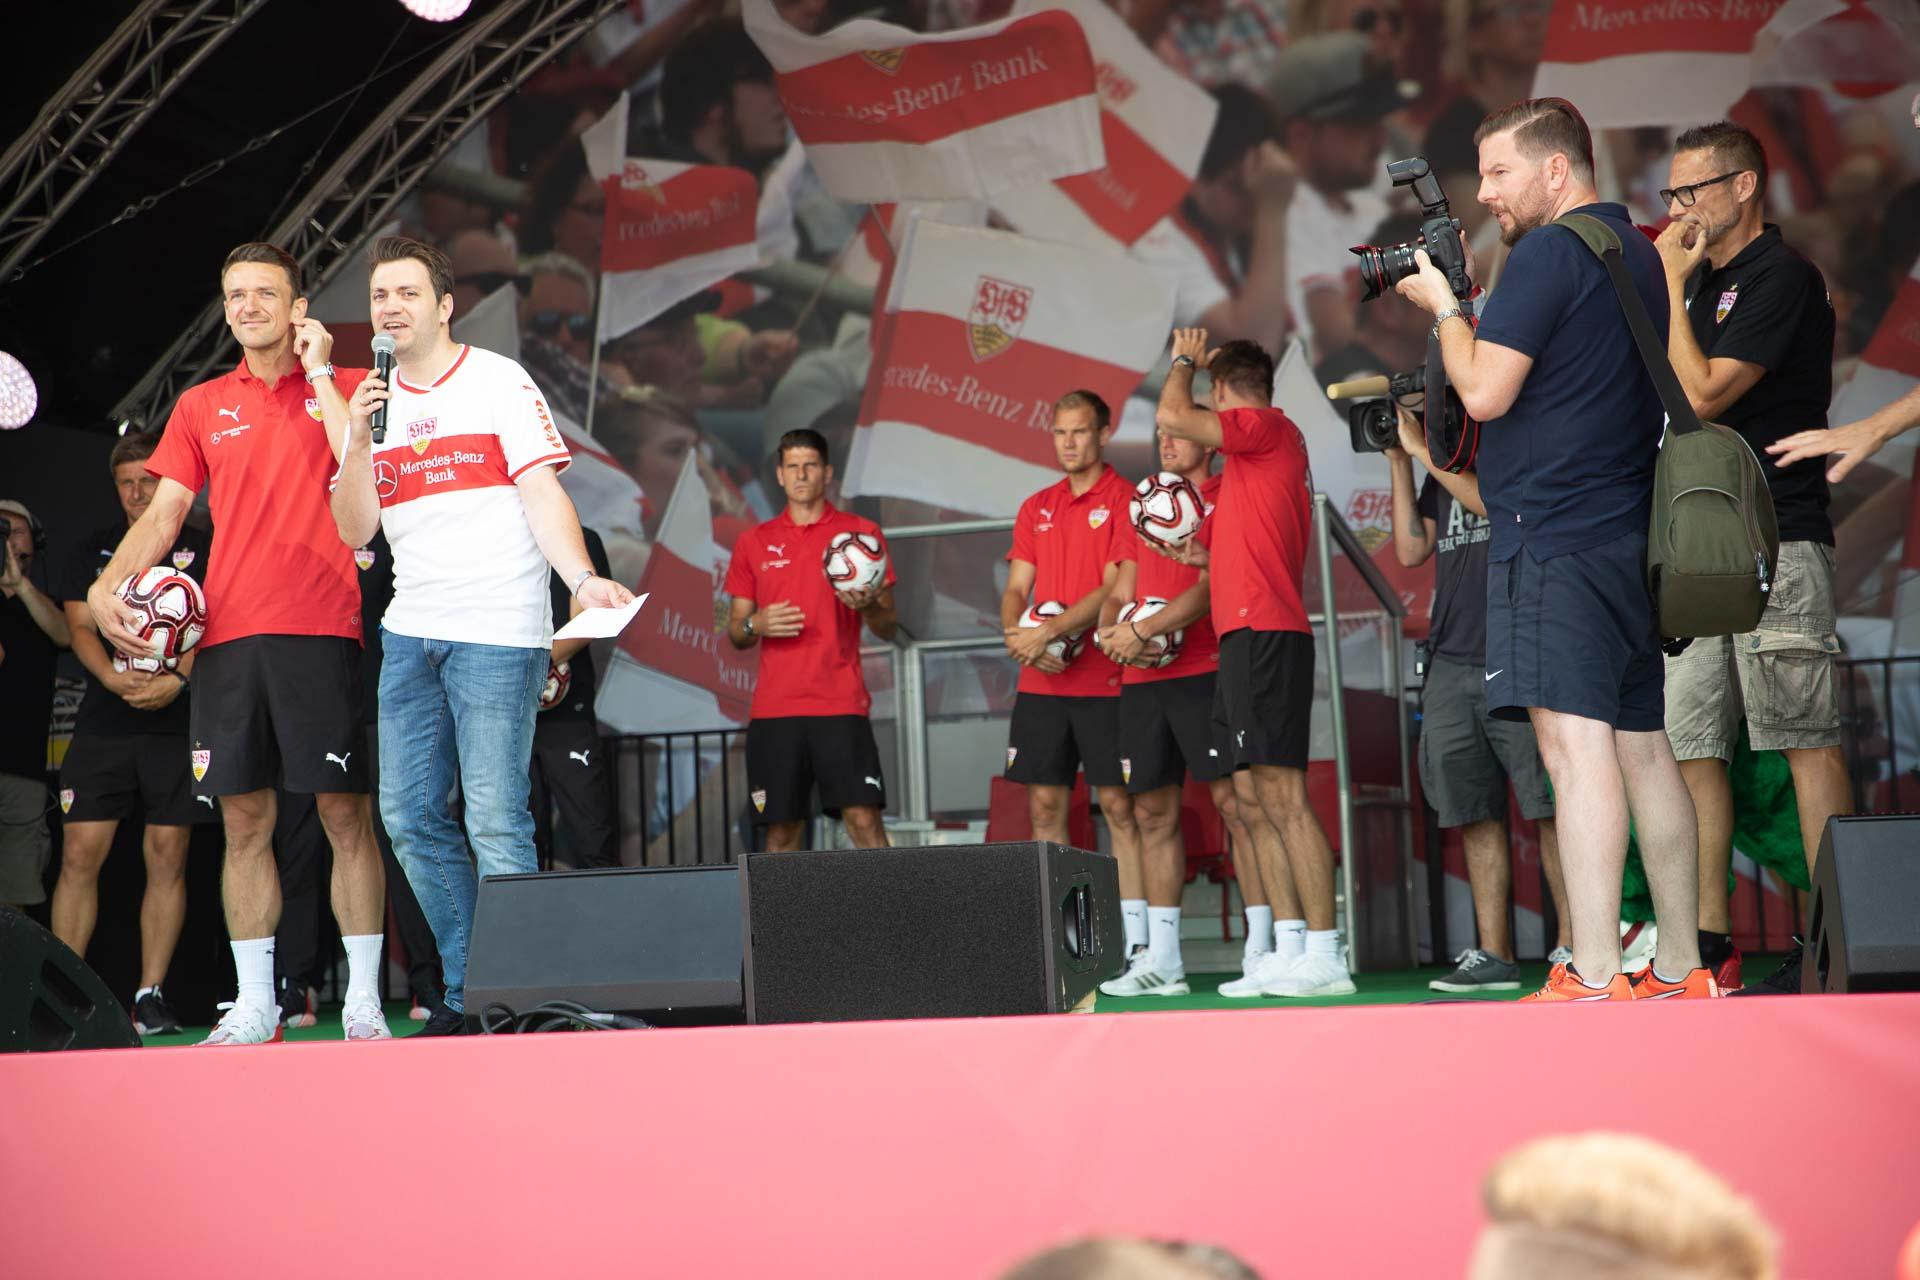 VFB Saisonauftakt 2018 /2019